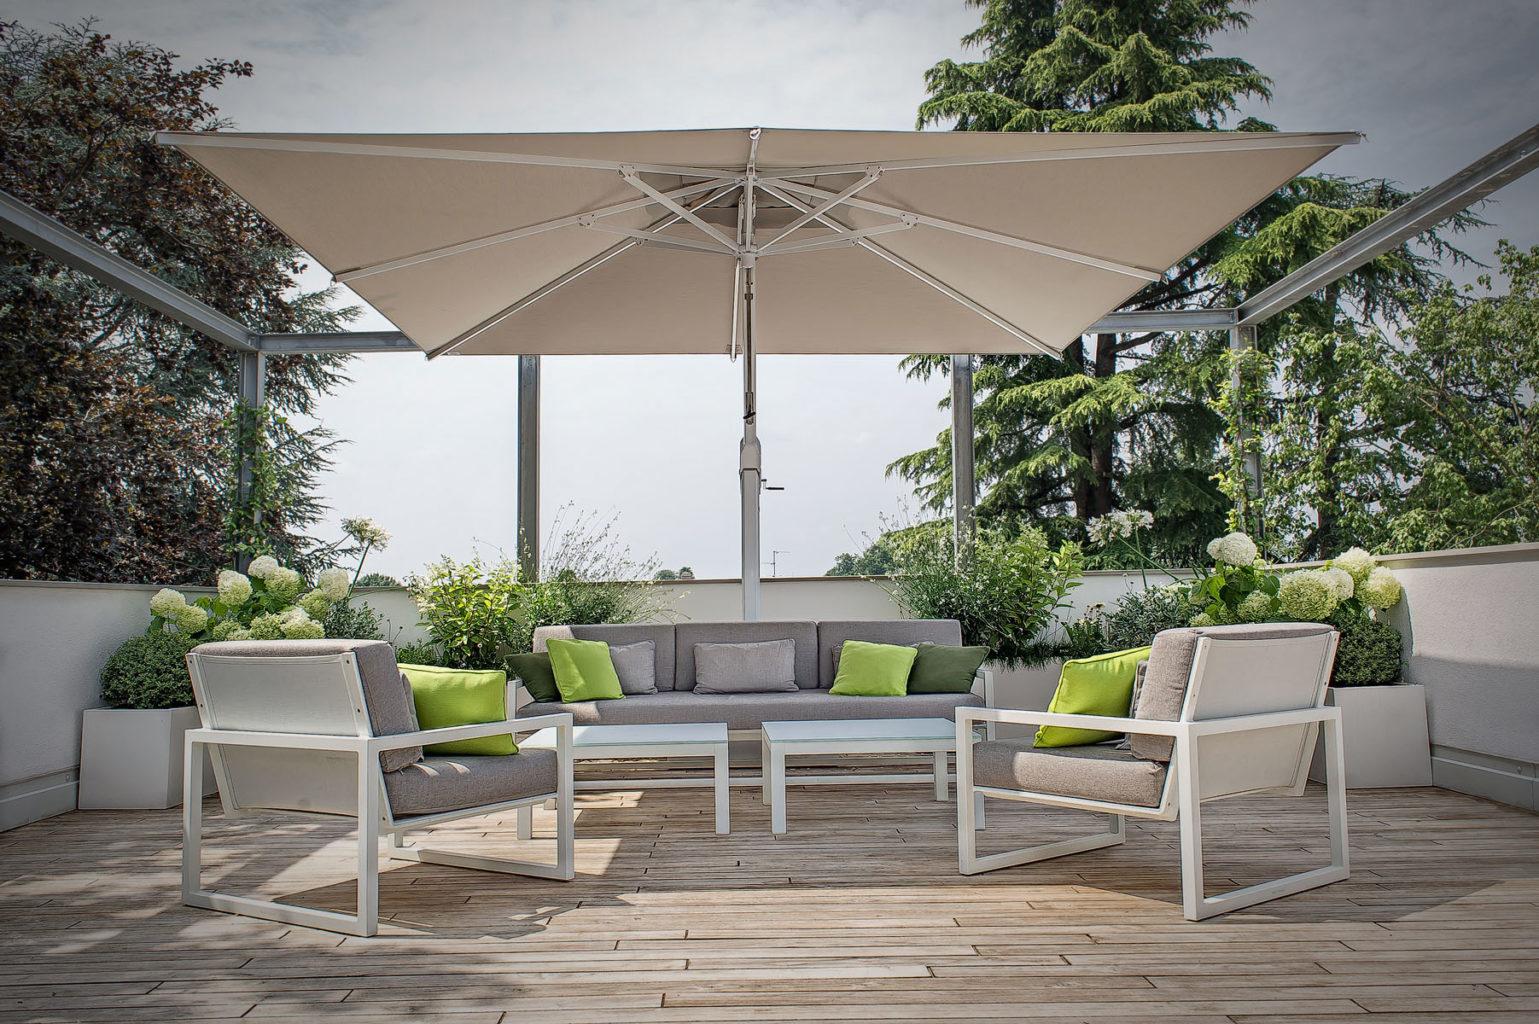 25 Inspirational Ideas to Create a Luxury Resort Style Backyard, poggesi usa king umbrella 01 1